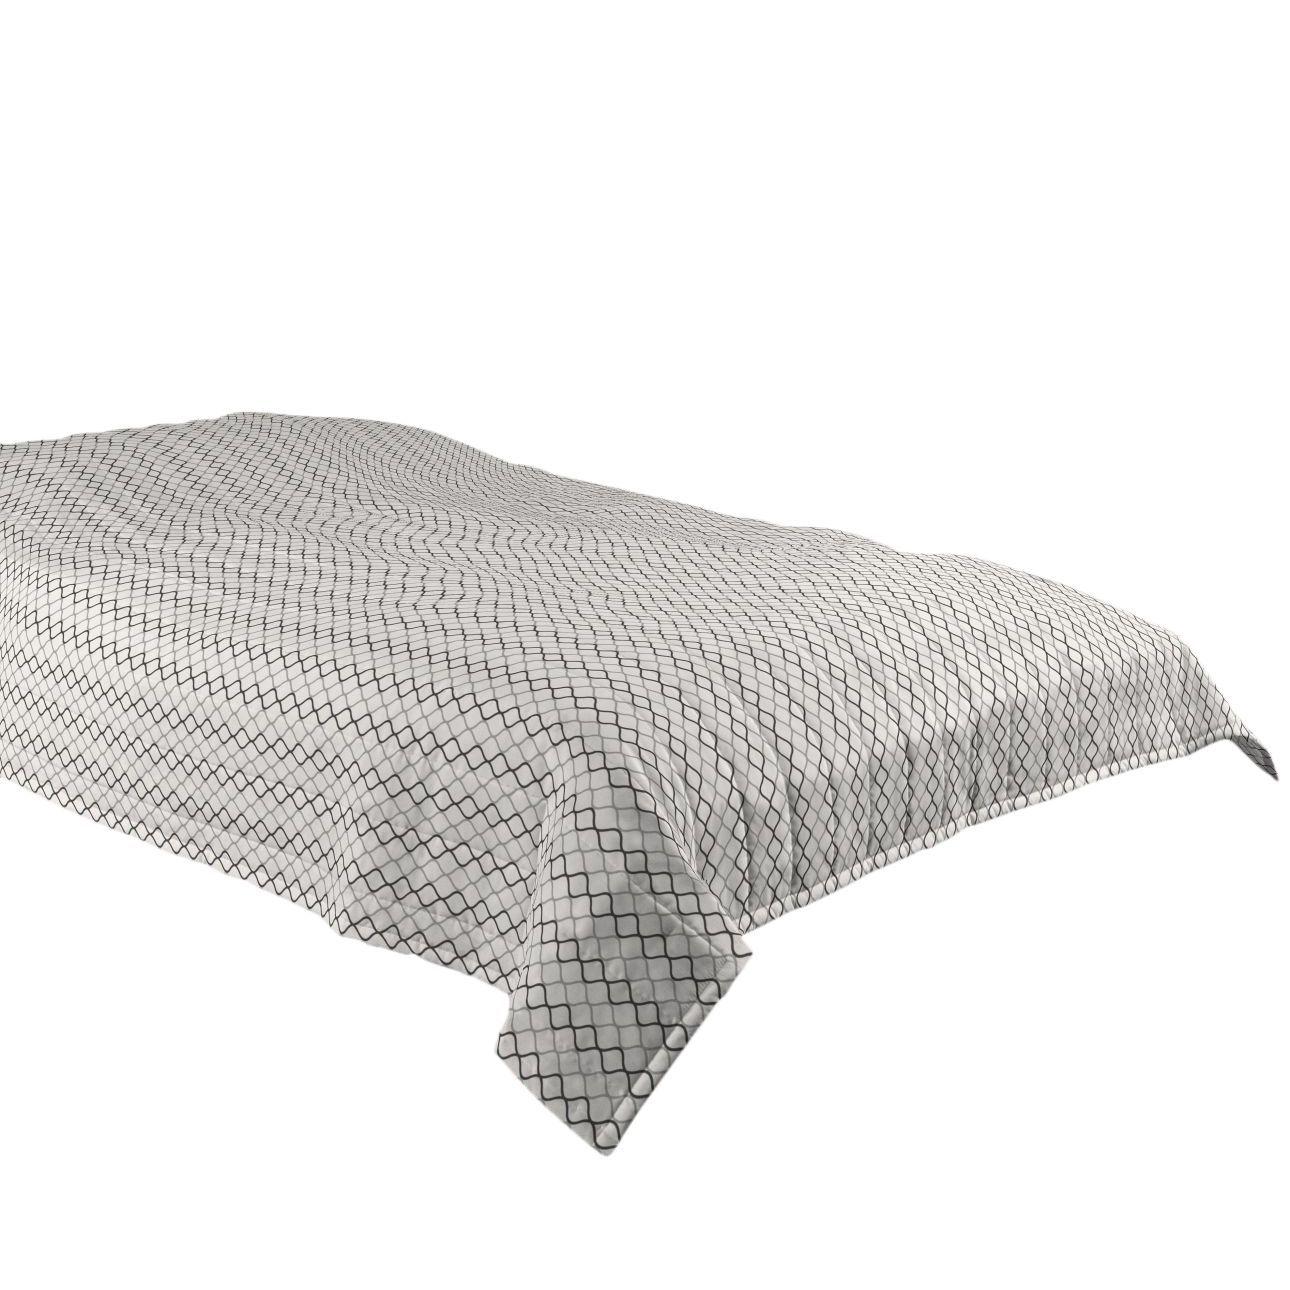 Patchwork Tagesdecke Selber Machen Bettüberwurf Grau